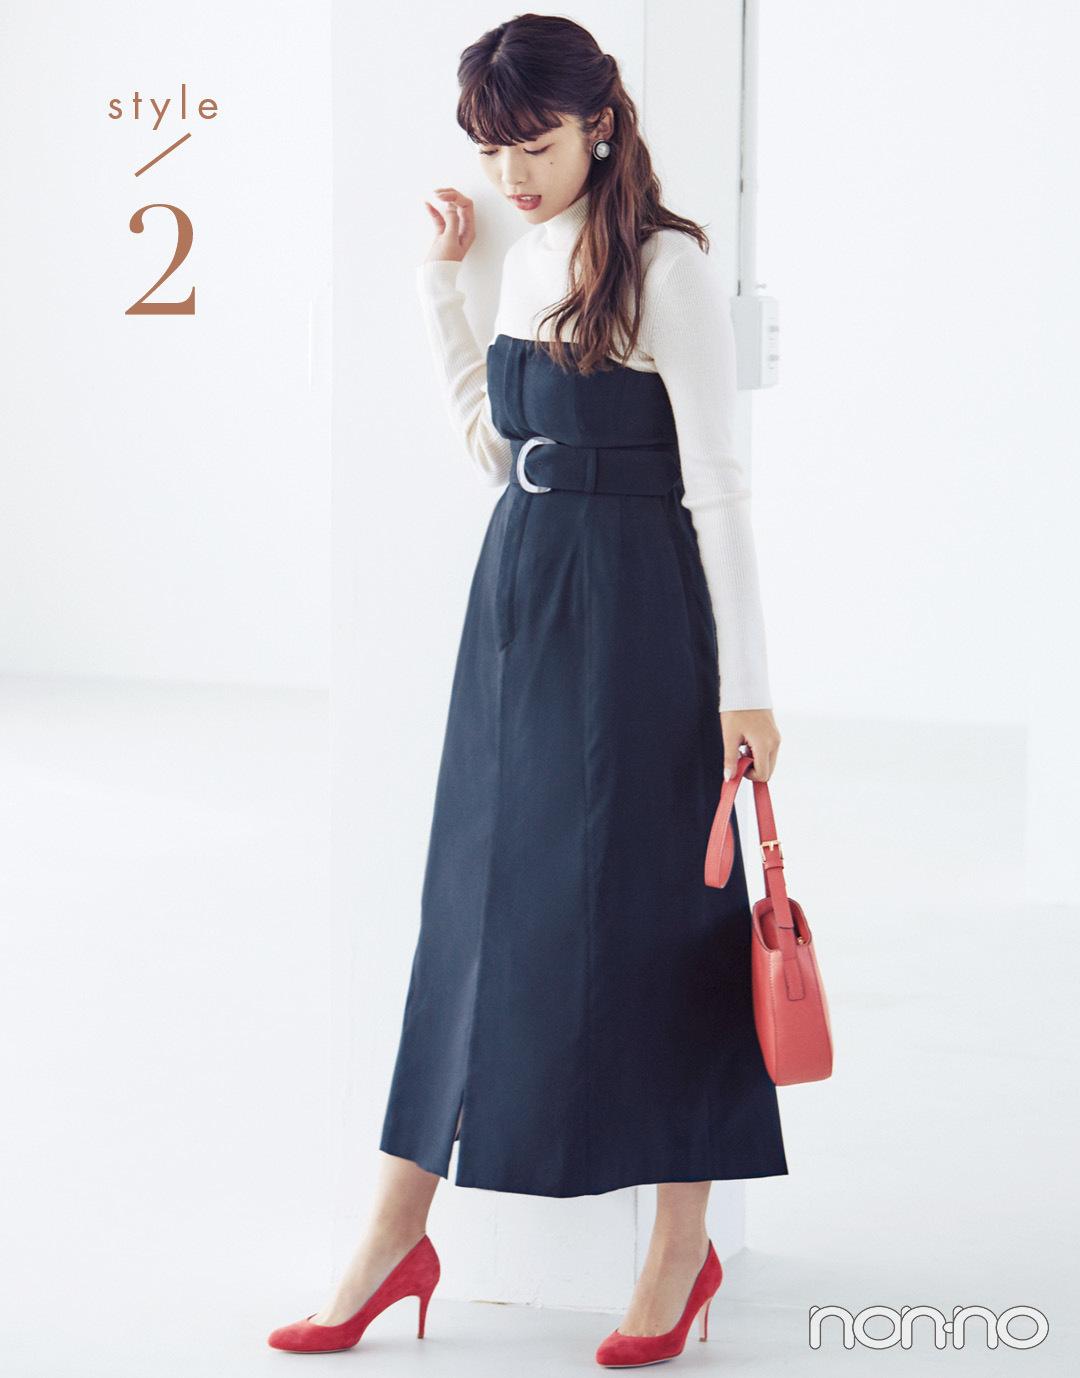 style/2